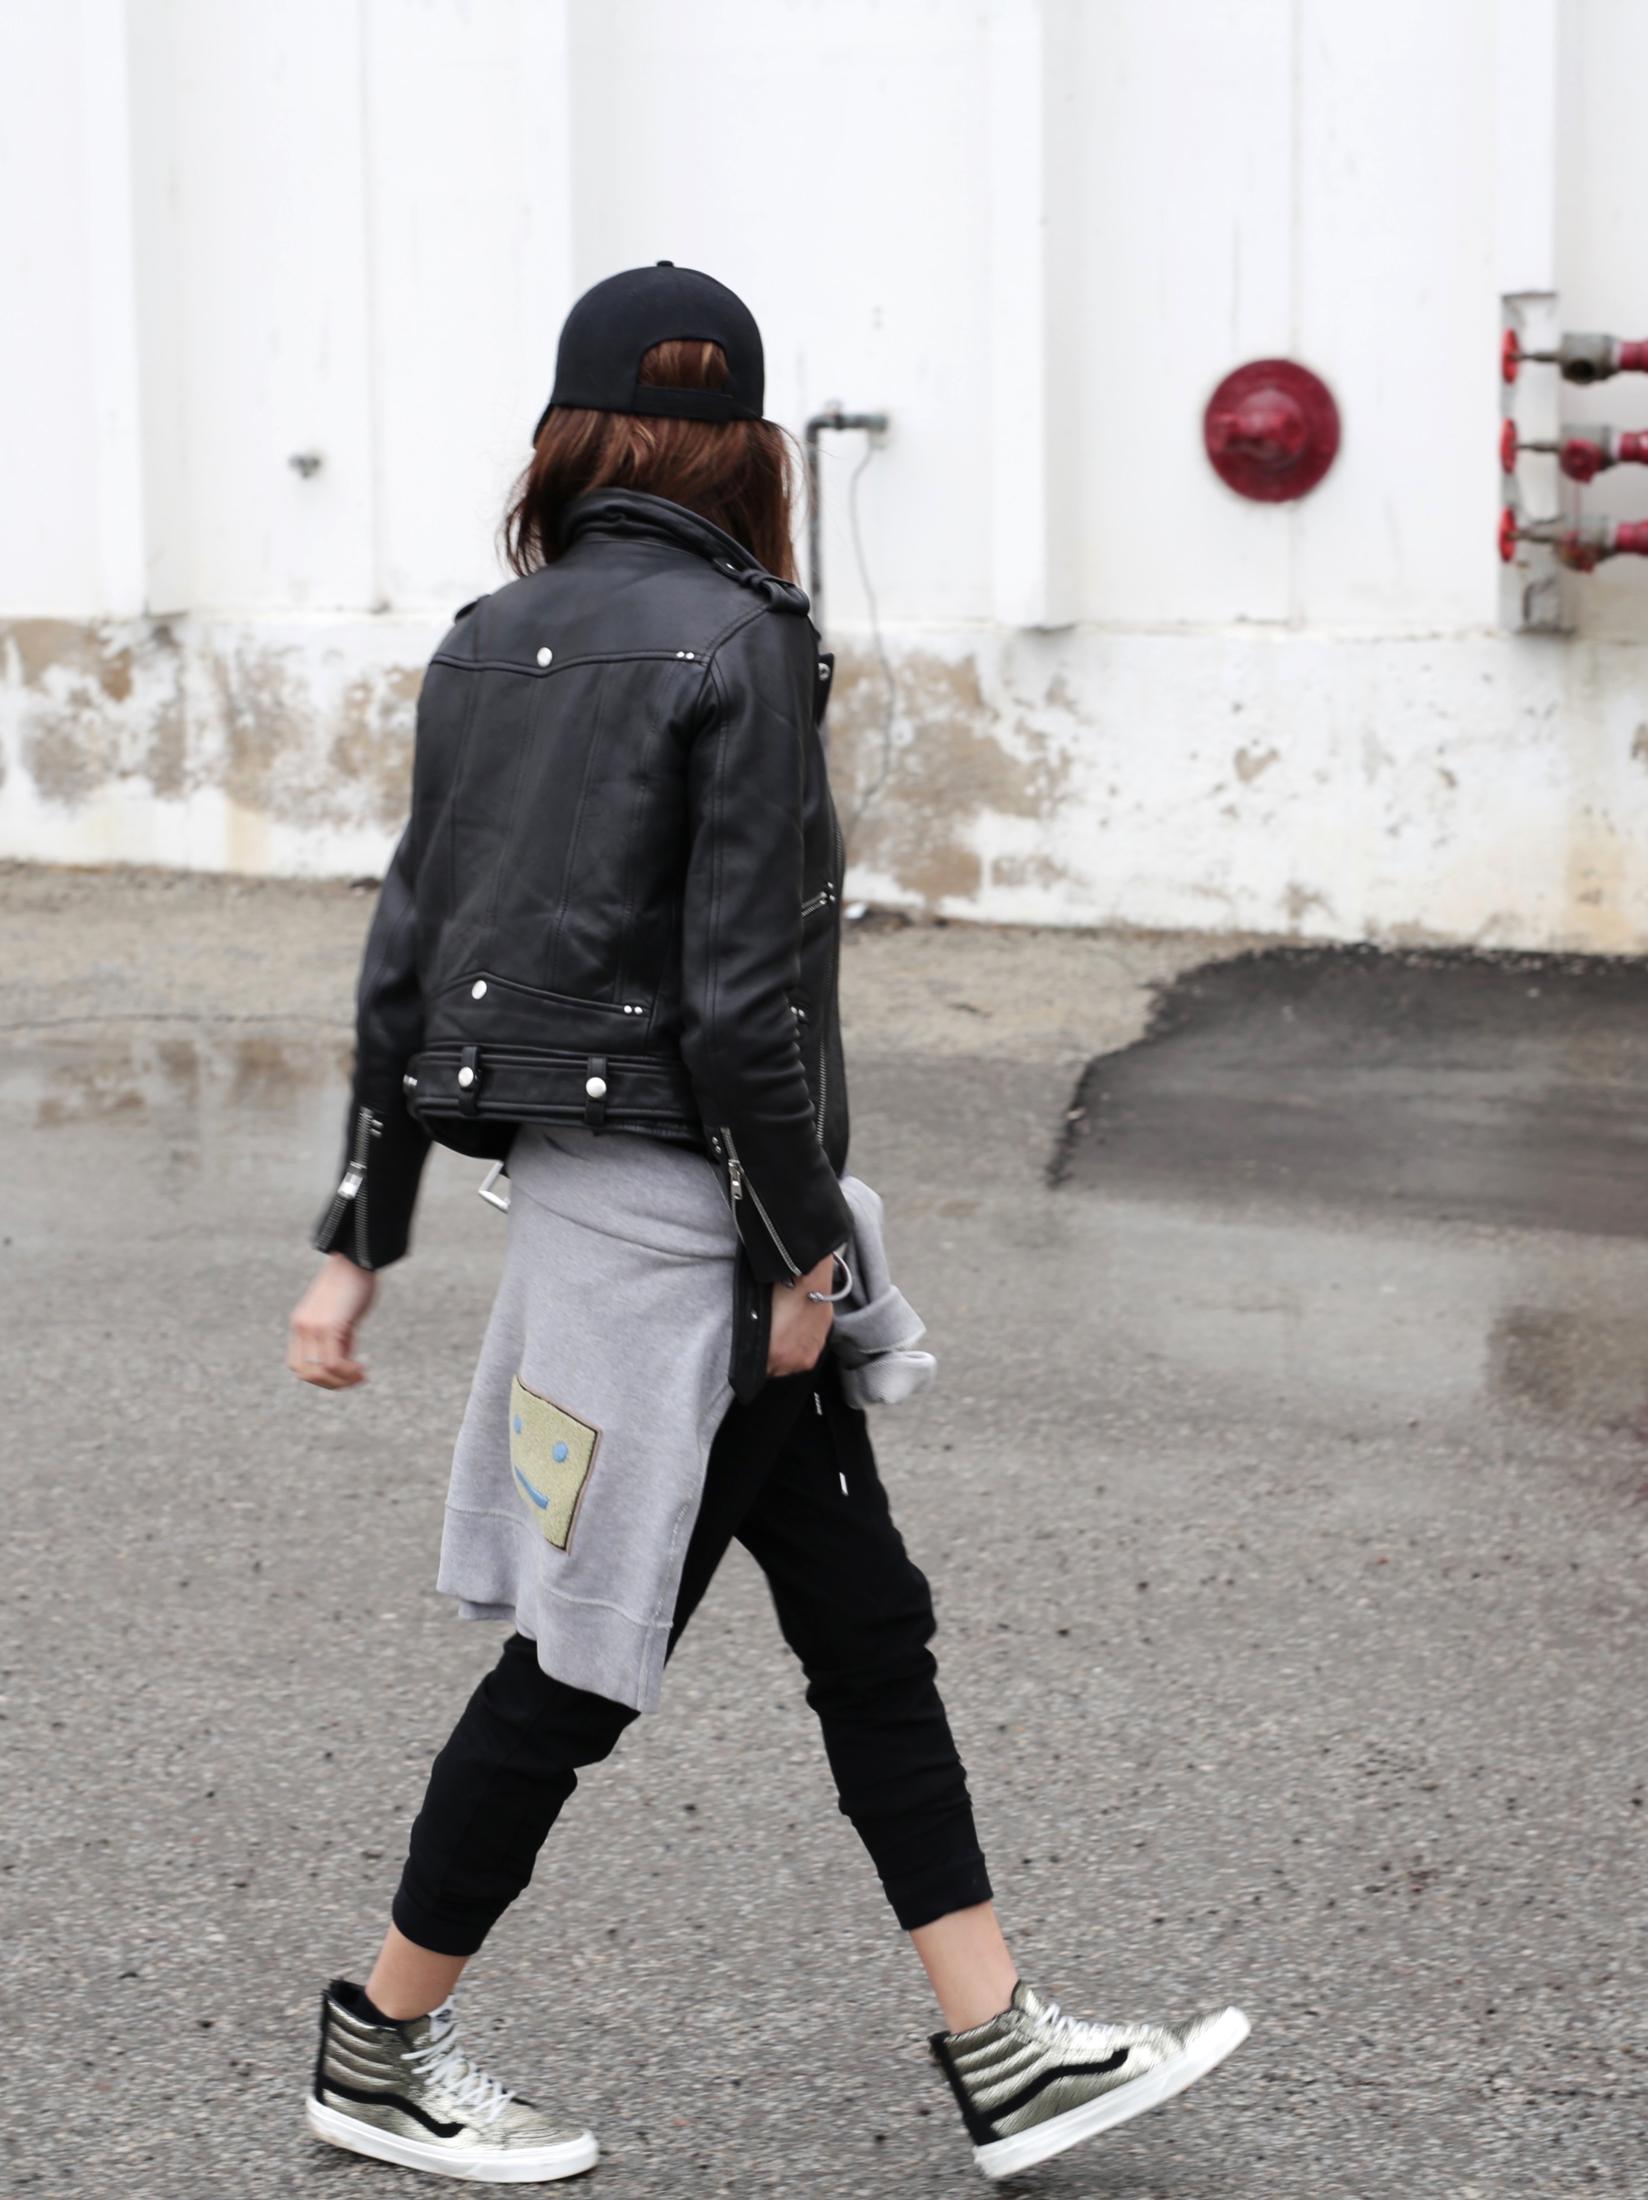 3 Ways To Rock Athleisure Wear - Leather Jacket, Acne Sweater, Alexander Wang Donna bag, metallic Vans sneakers_7637.JPG